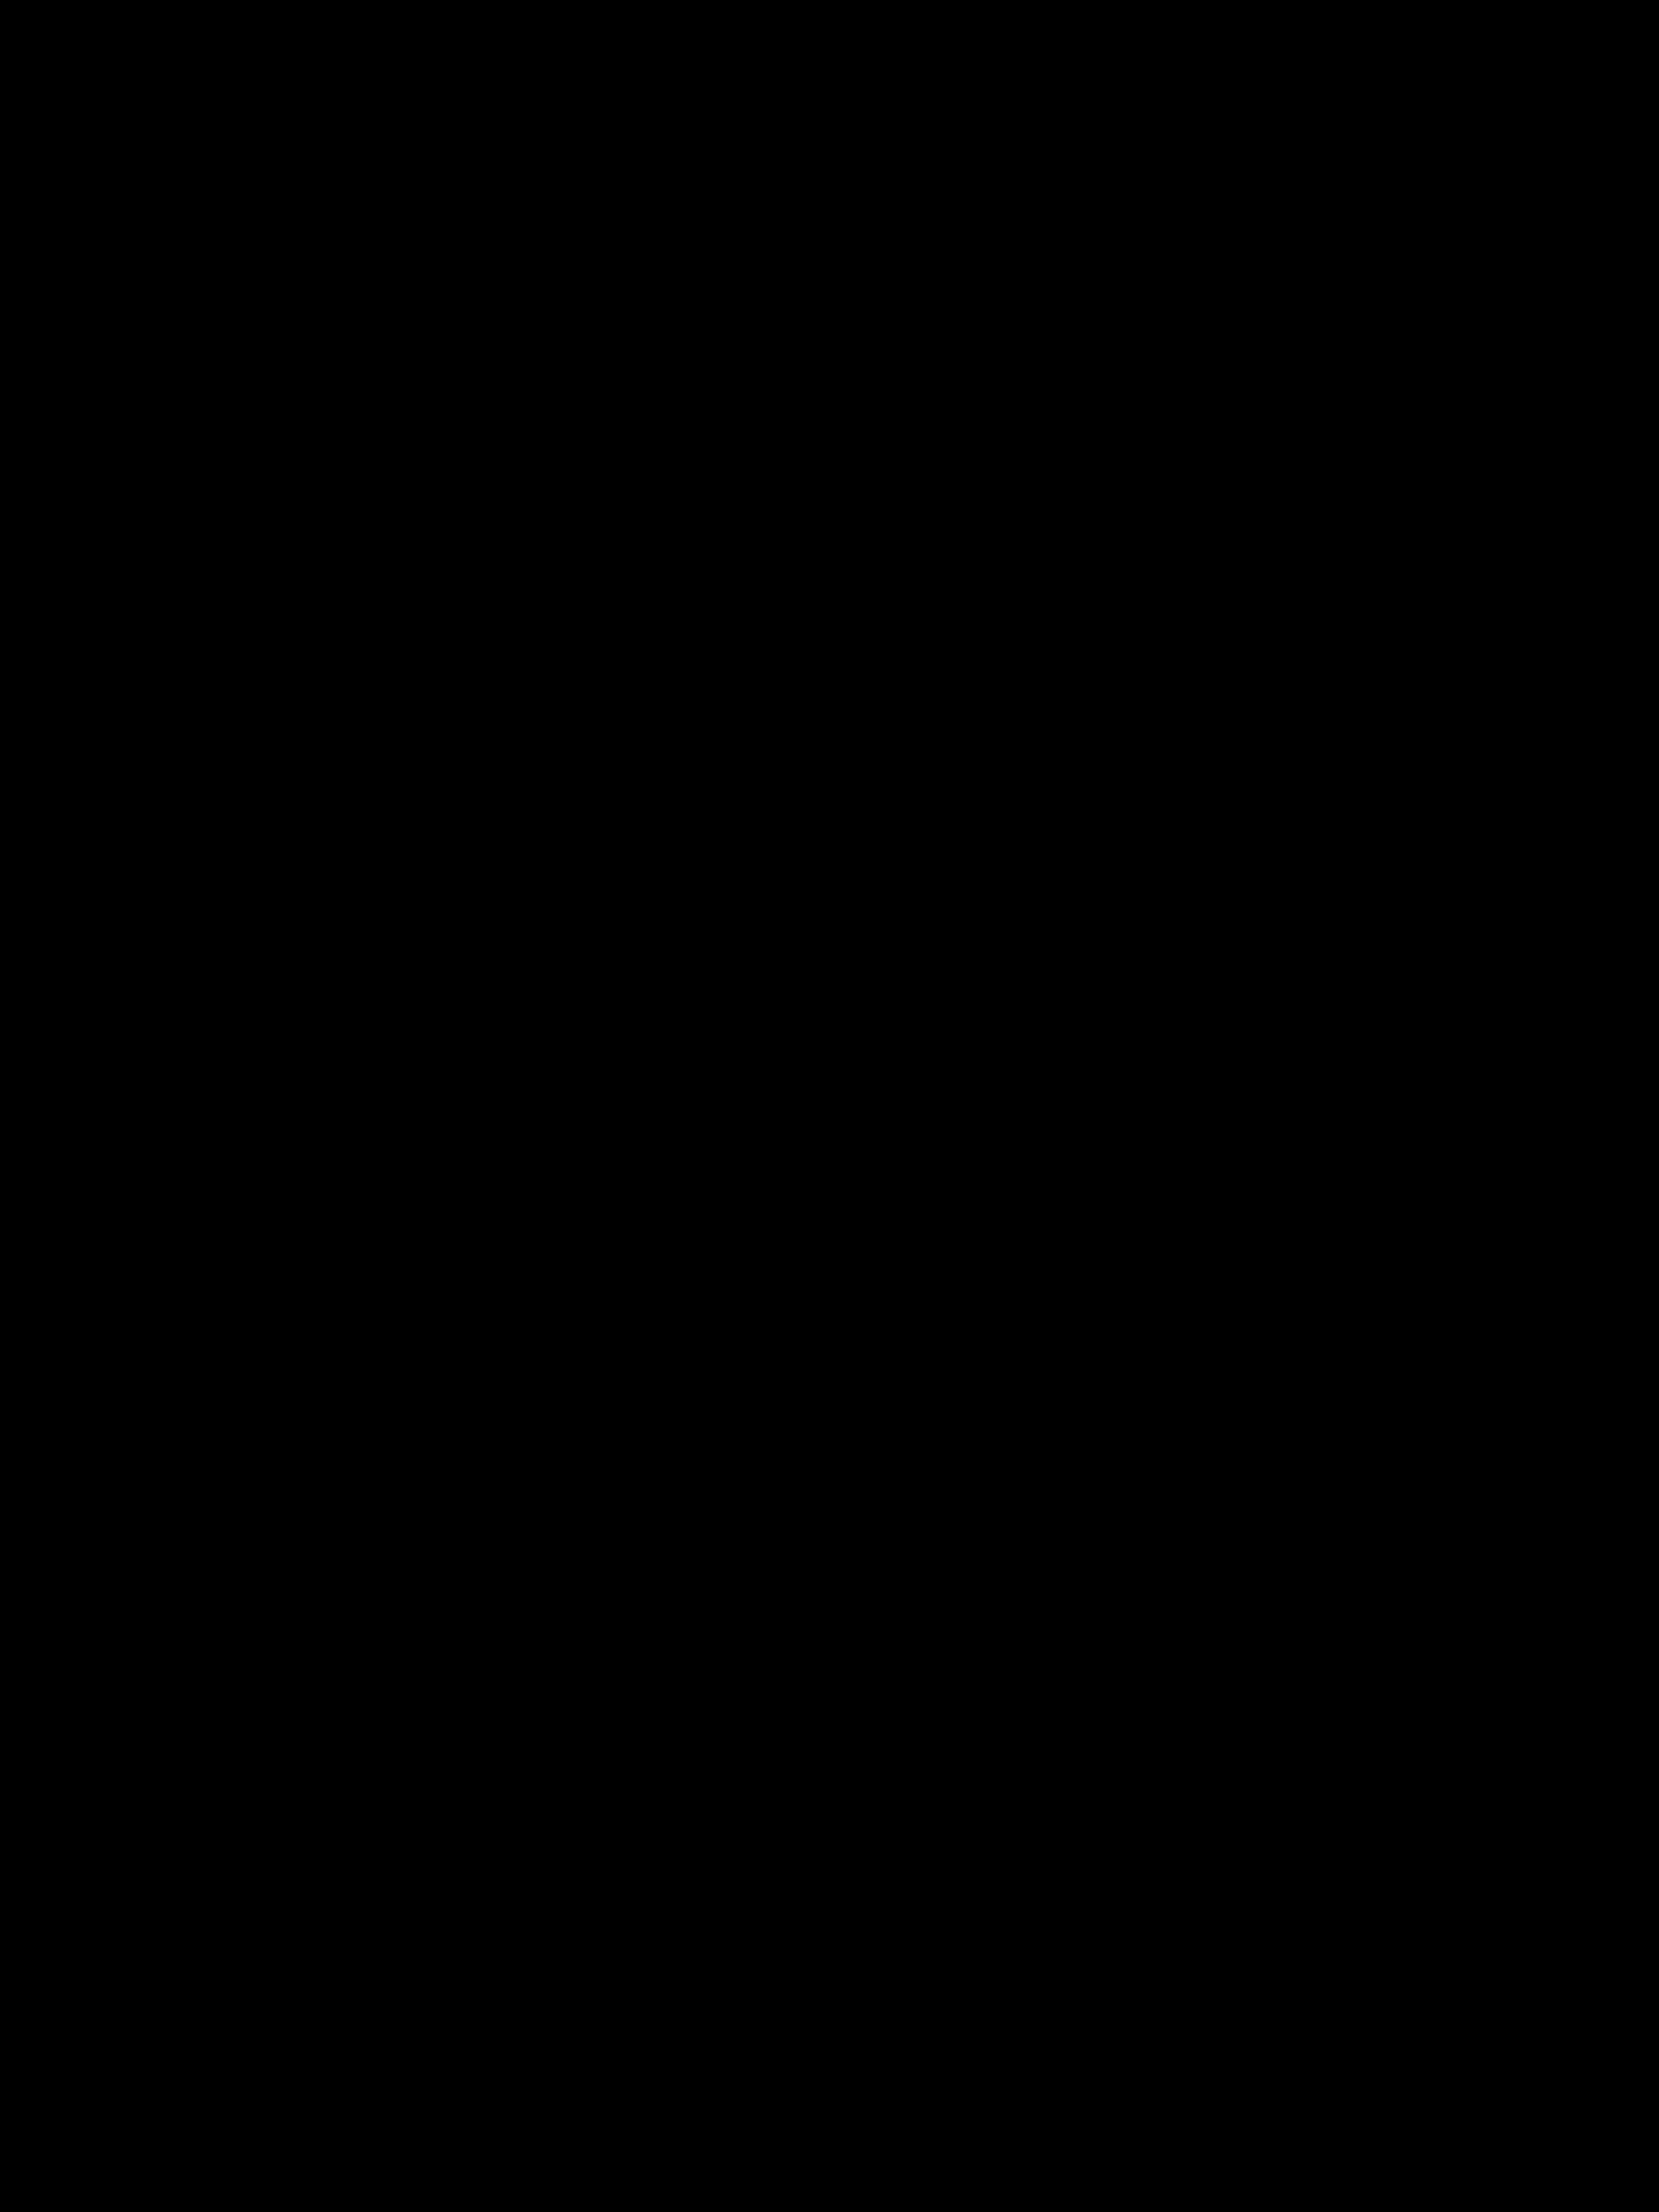 img-0537